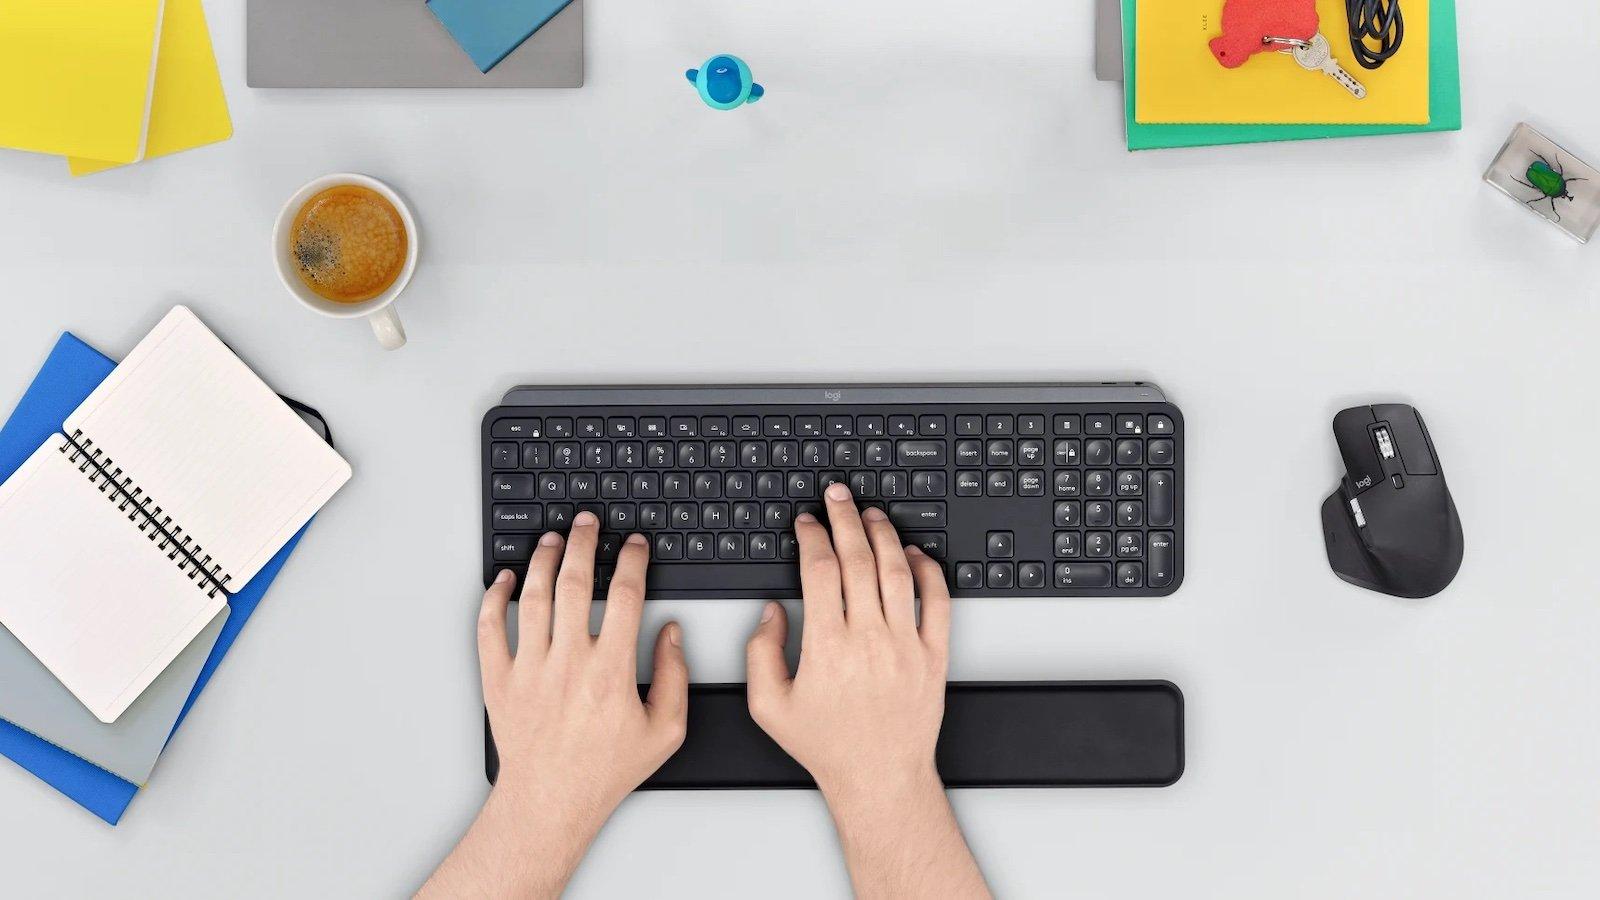 Logitech Master Series MX Keys creative keyboard boasts a fluid, natural keystroke